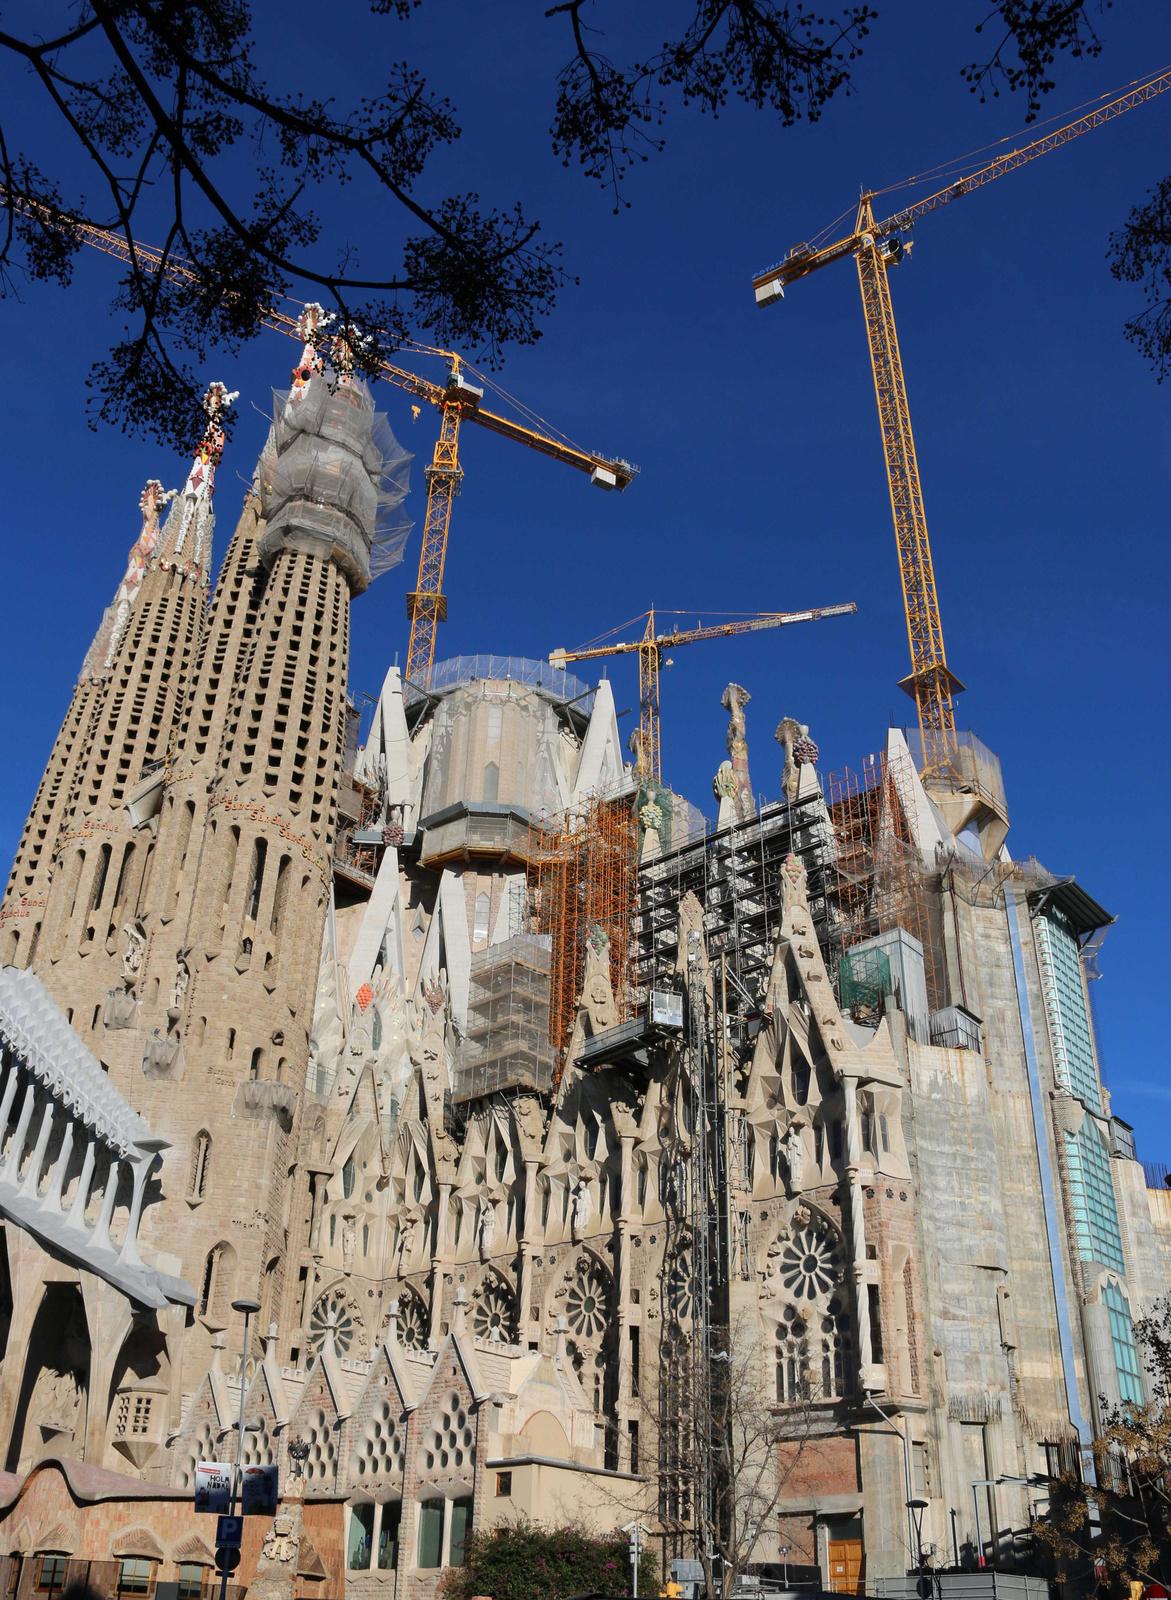 Barcelona 154